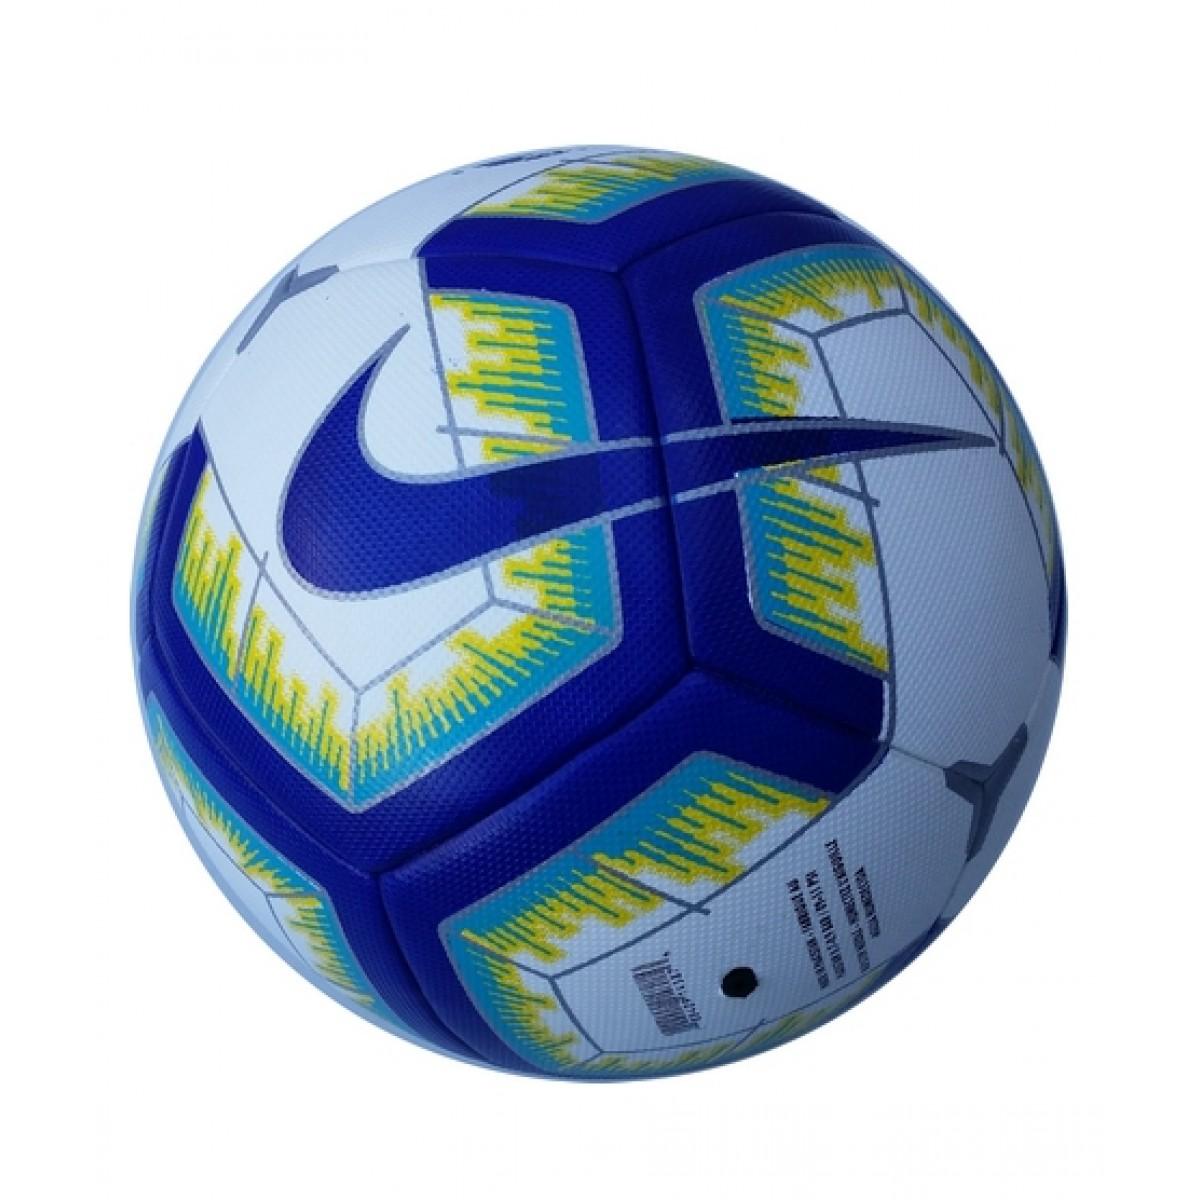 agua Saca la aseguranza Doncella  Nike English Premier League 2018-19 Football Price in Pakistan | Buy Nike  English Premier League Football Blue/Yellow | iShopping.pk